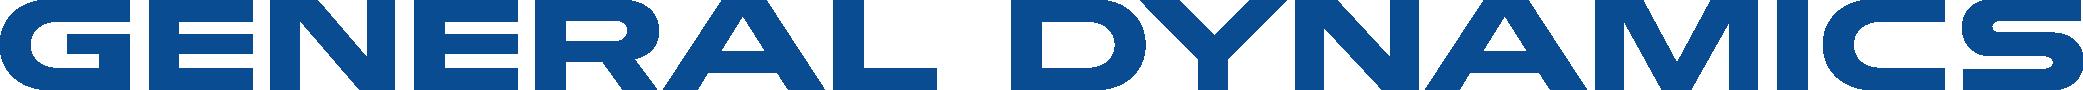 General Dynamics Logo png